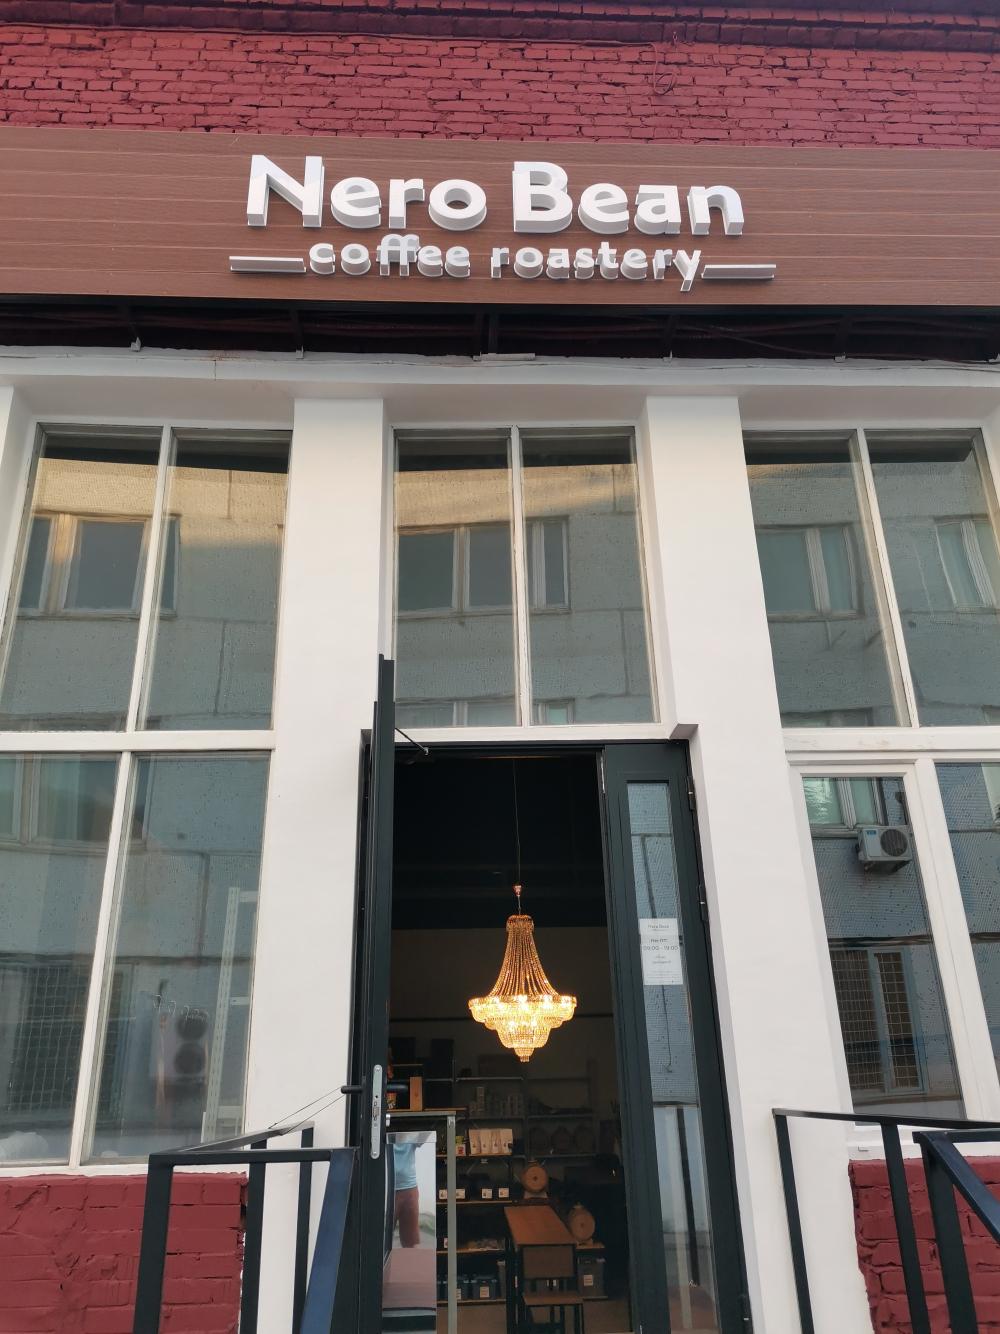 г Москва<br/>Nerobean coffee roastery<br/>250 руб/ч